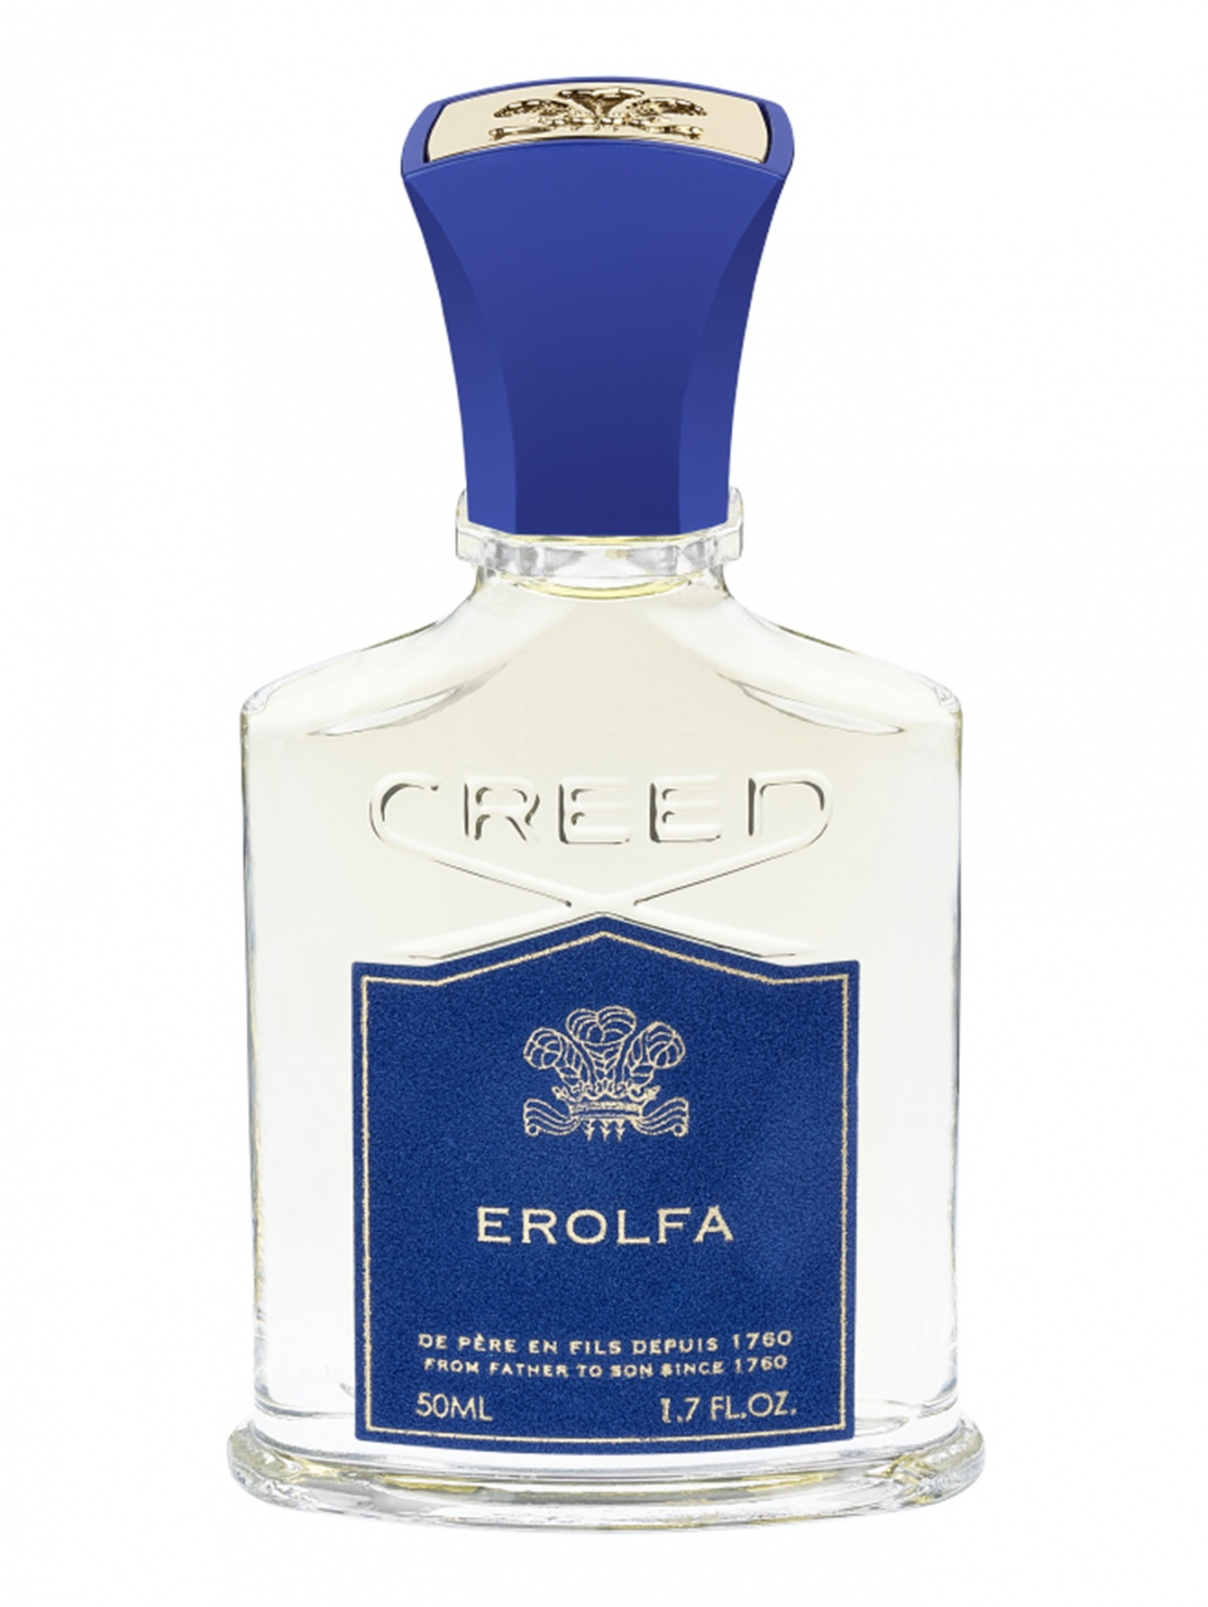 Парфюмерная вода 50 мл Erolfa Creed  –  Общий вид